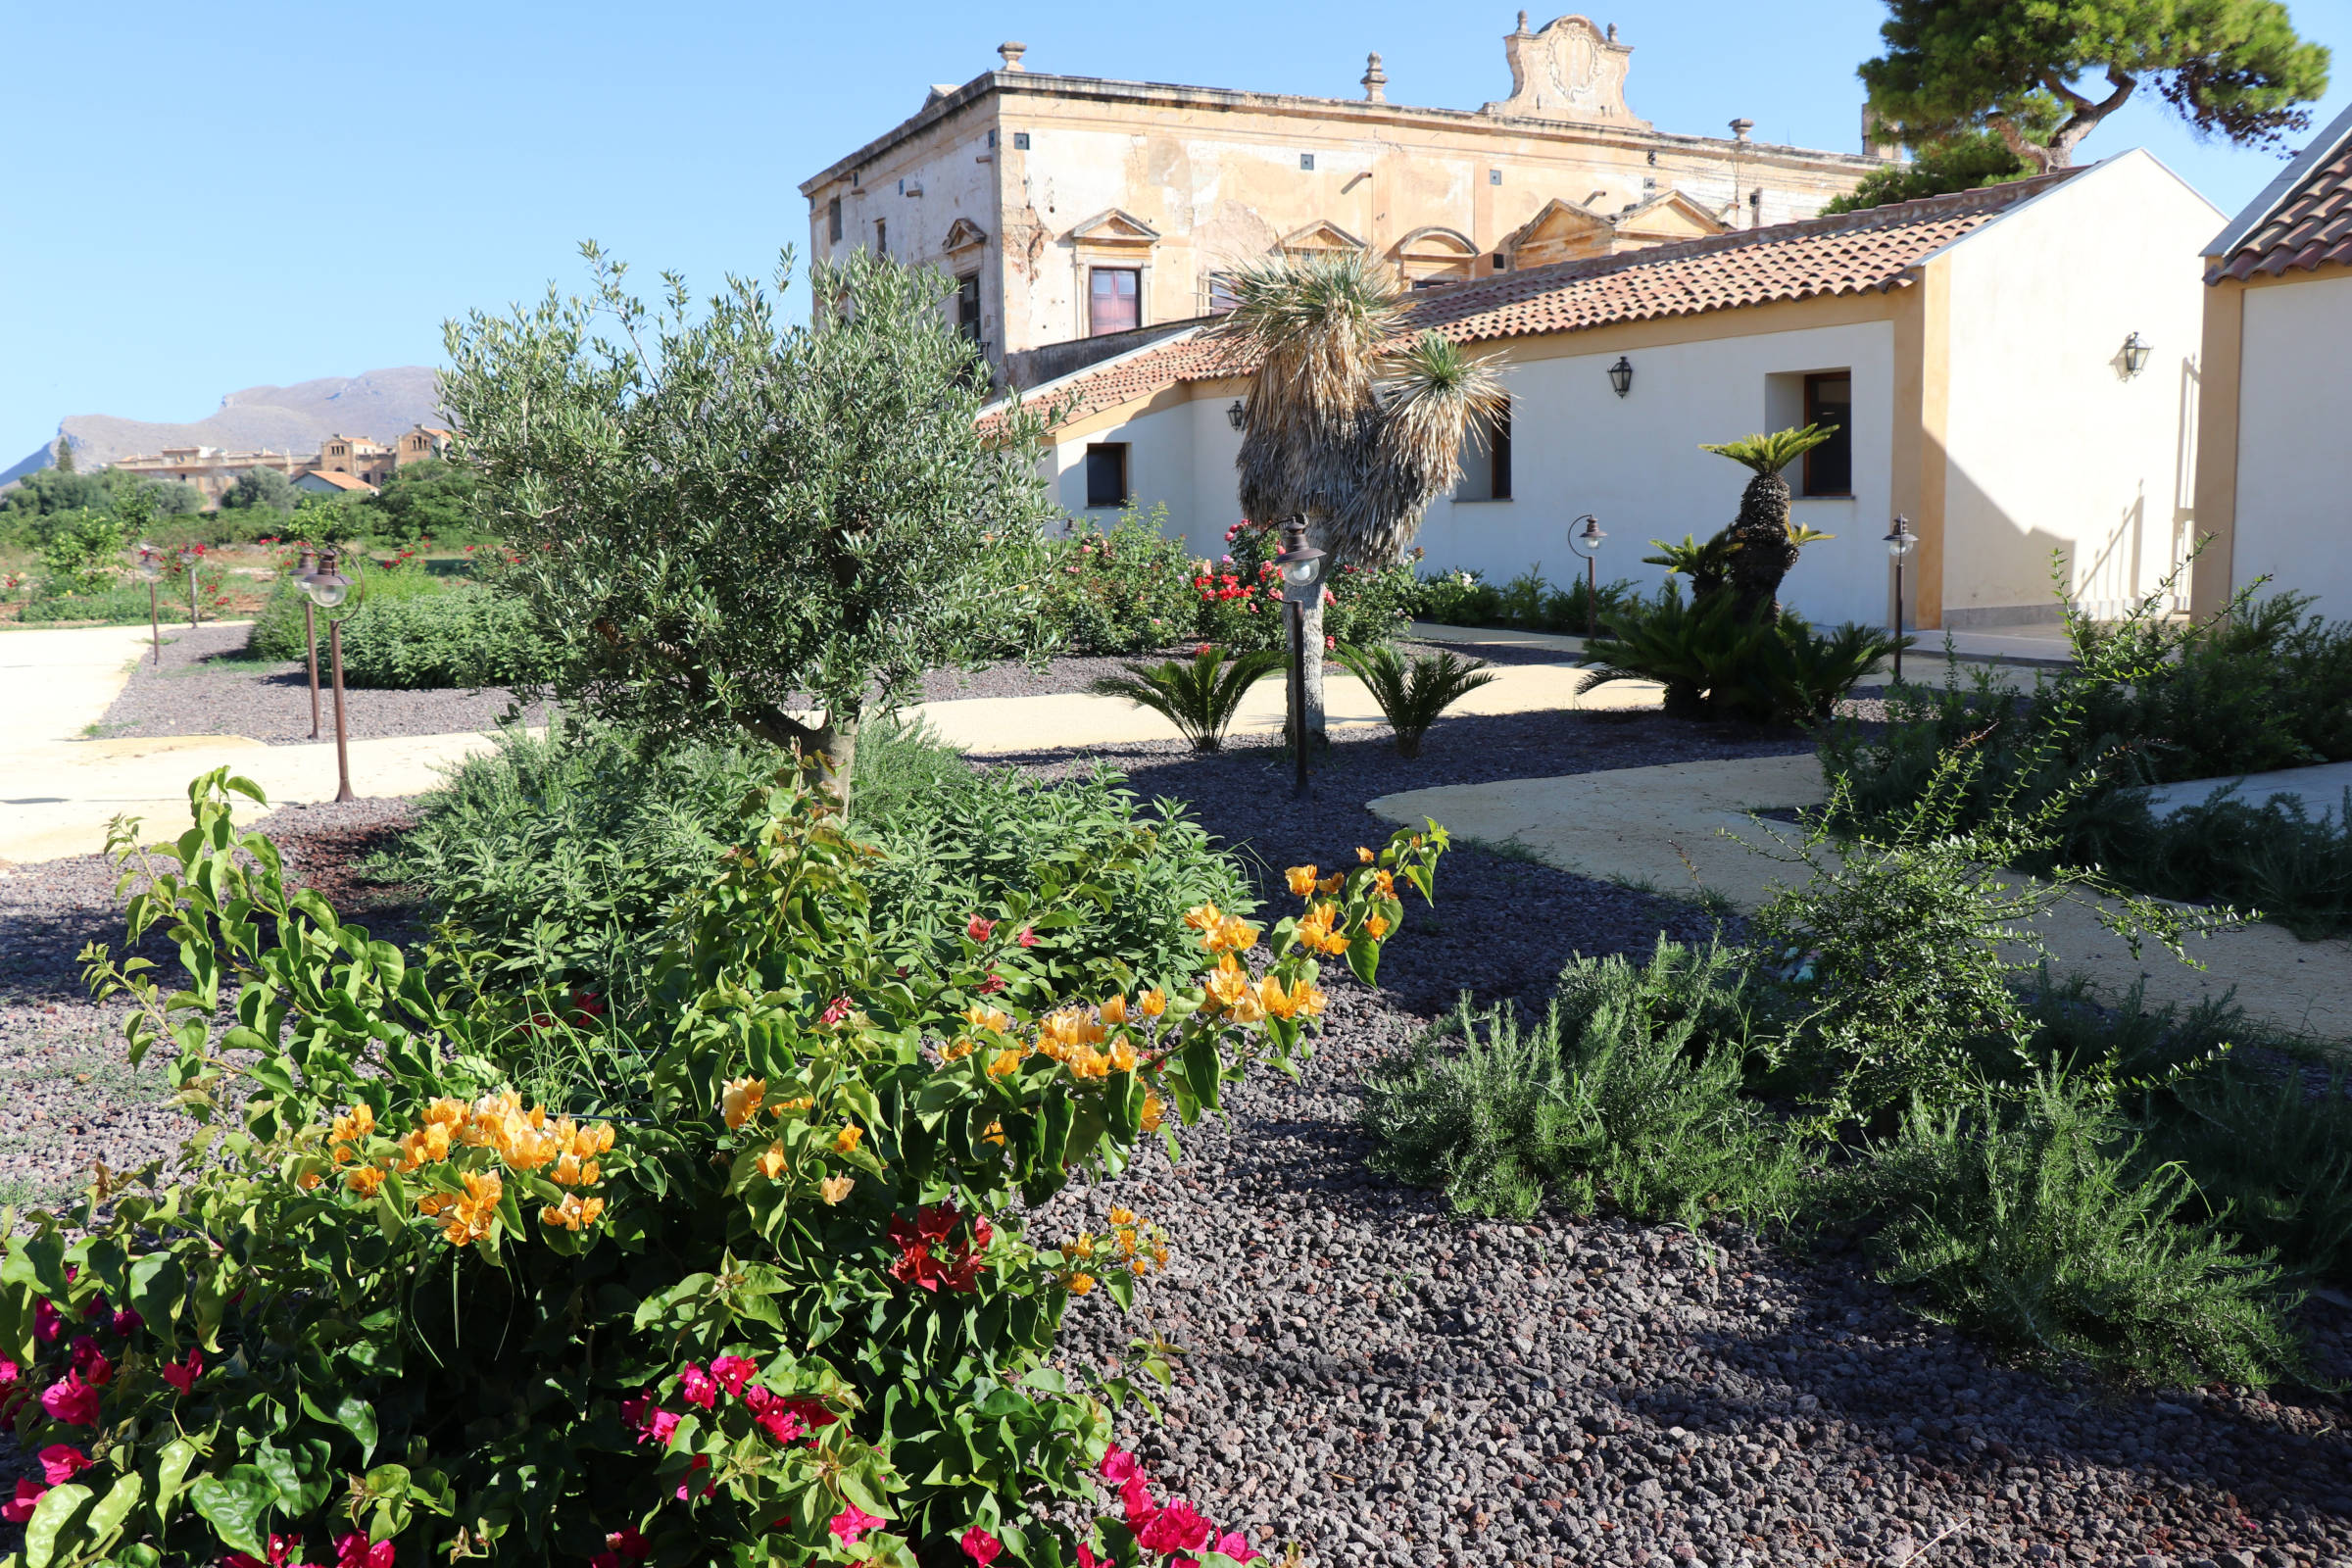 Giardino Villa Lampedusa